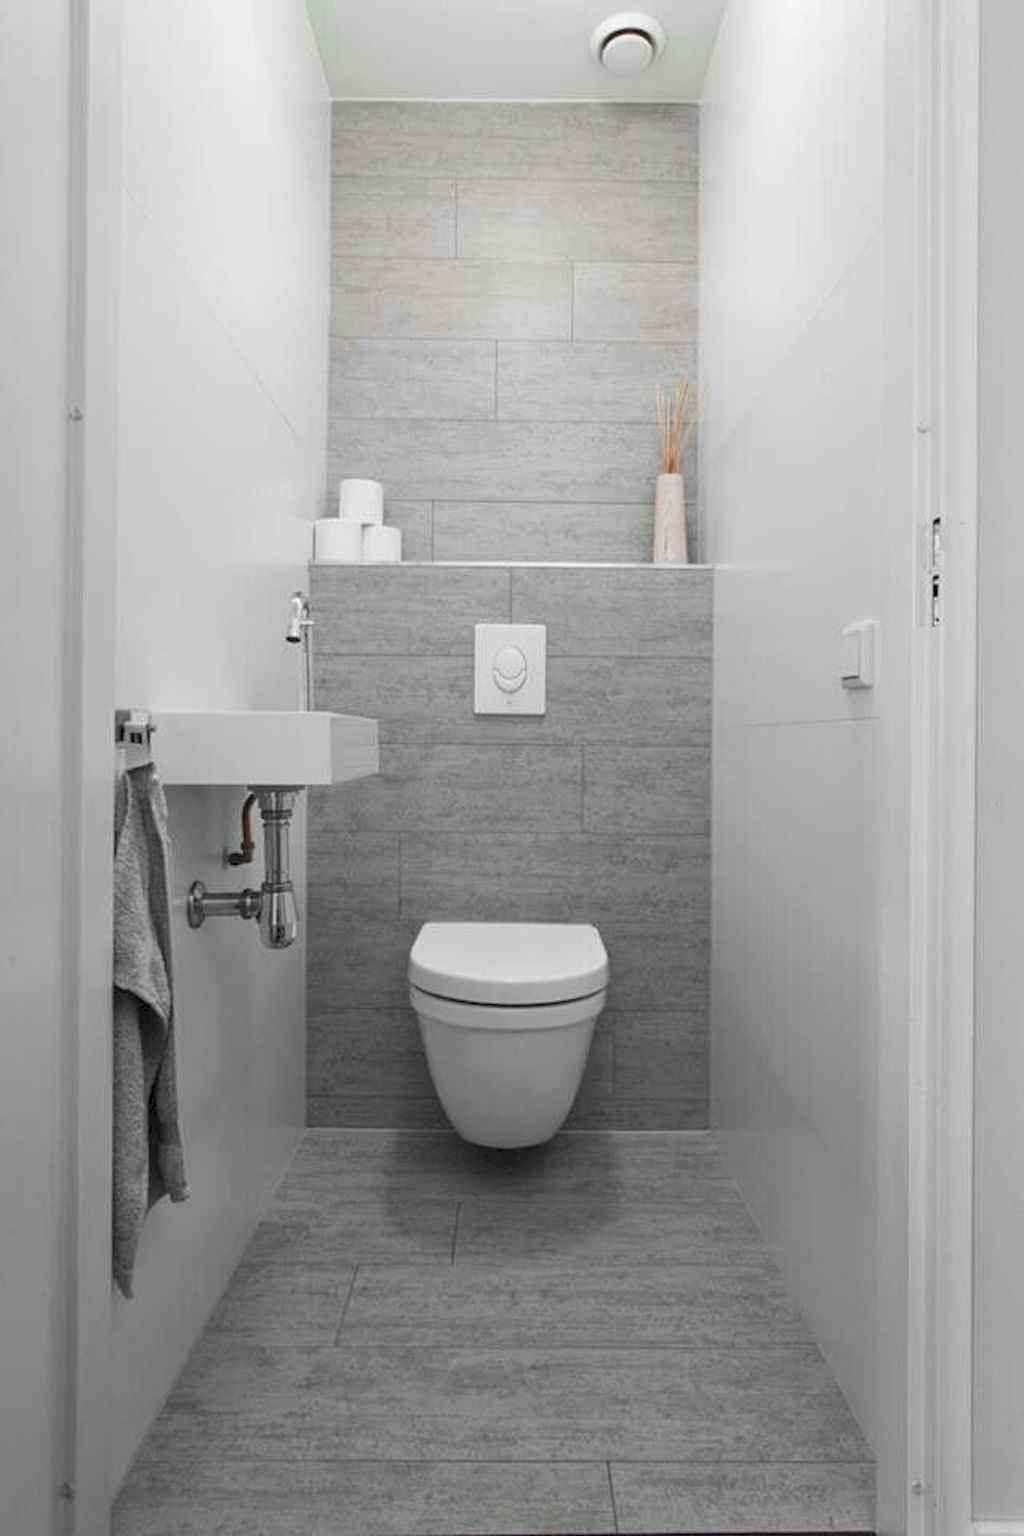 65 Genius Tiny House Bathroom Shower Design Ideas 2019 Tiny House Bathroom Bathroom Shower Design Bathroom Interior Design